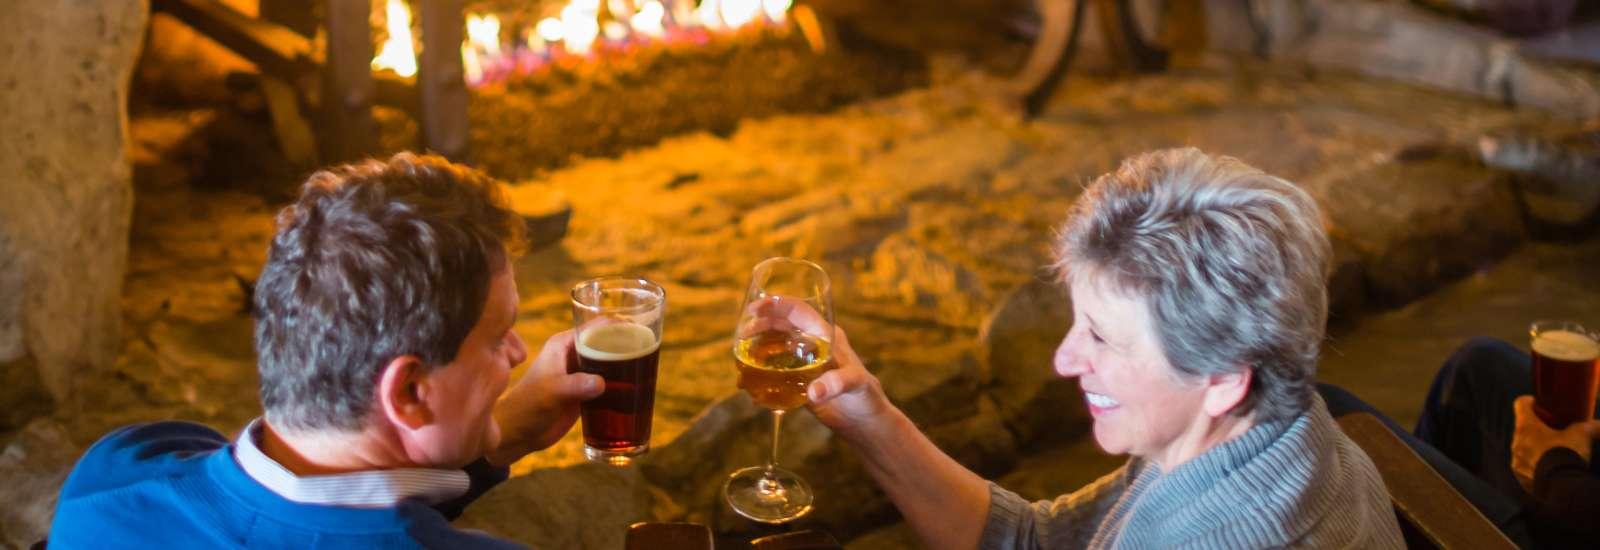 Omni Grove Park Inn Fireplace